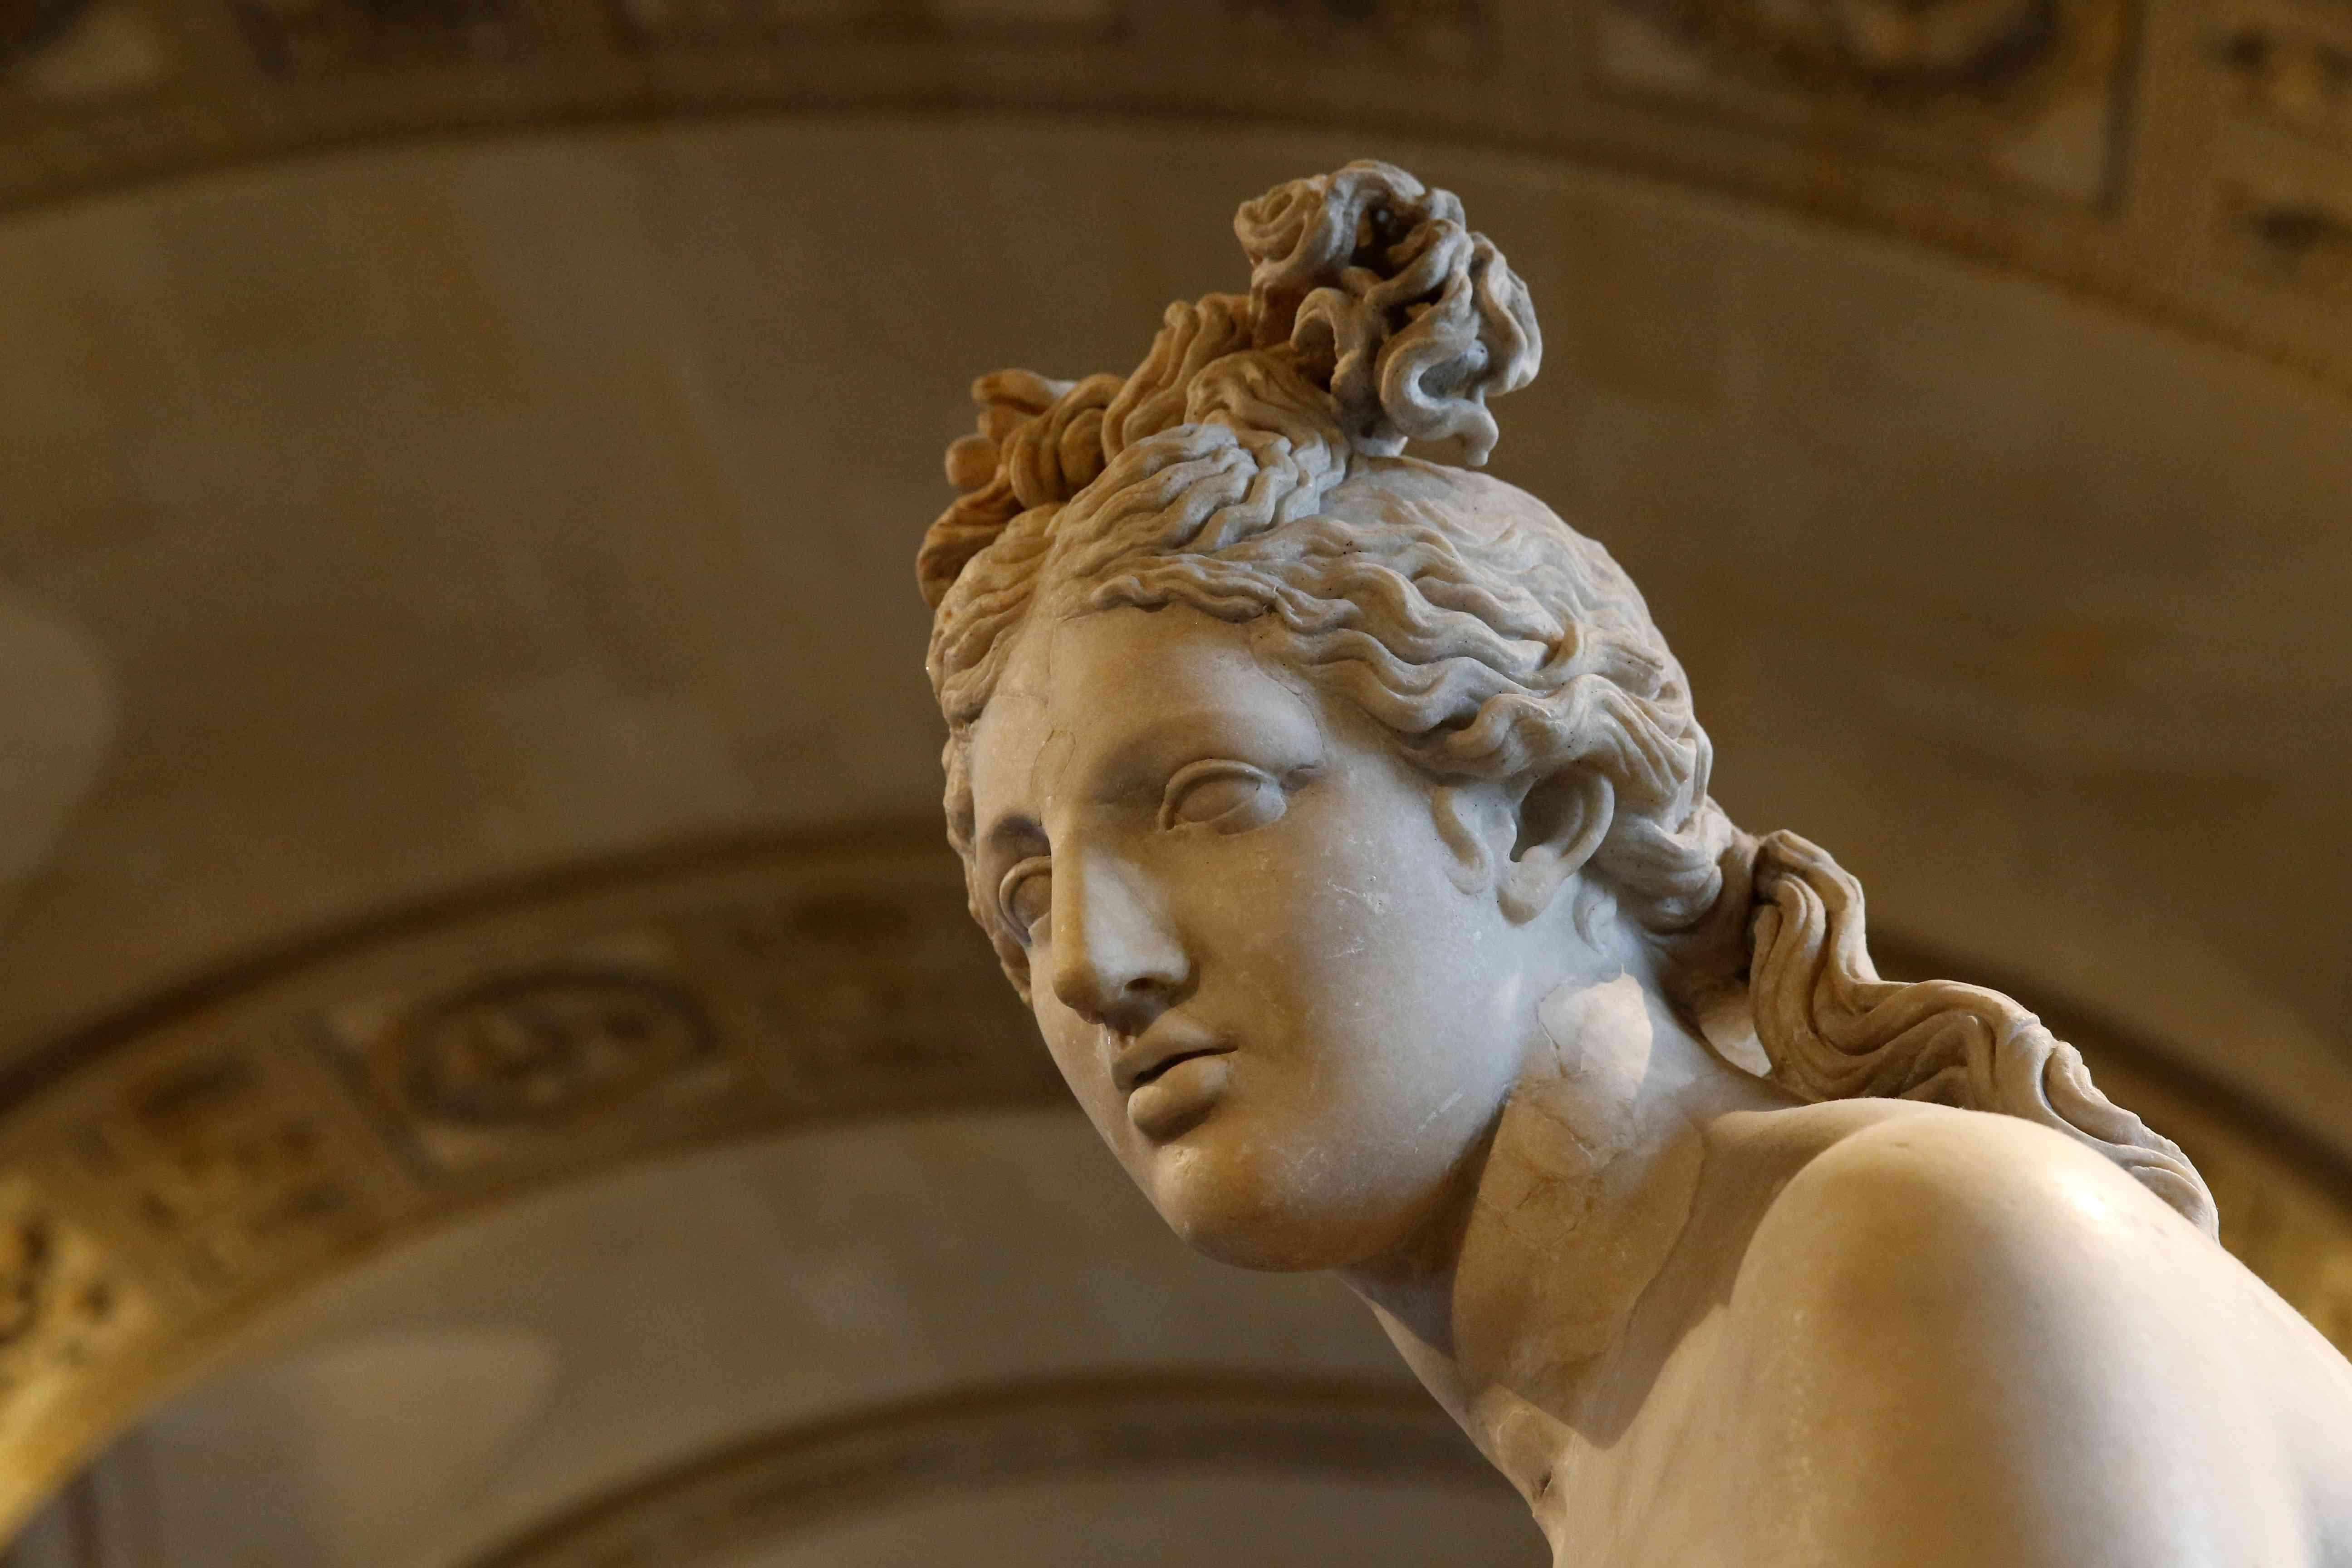 Aphroditenskulptur im Louvre